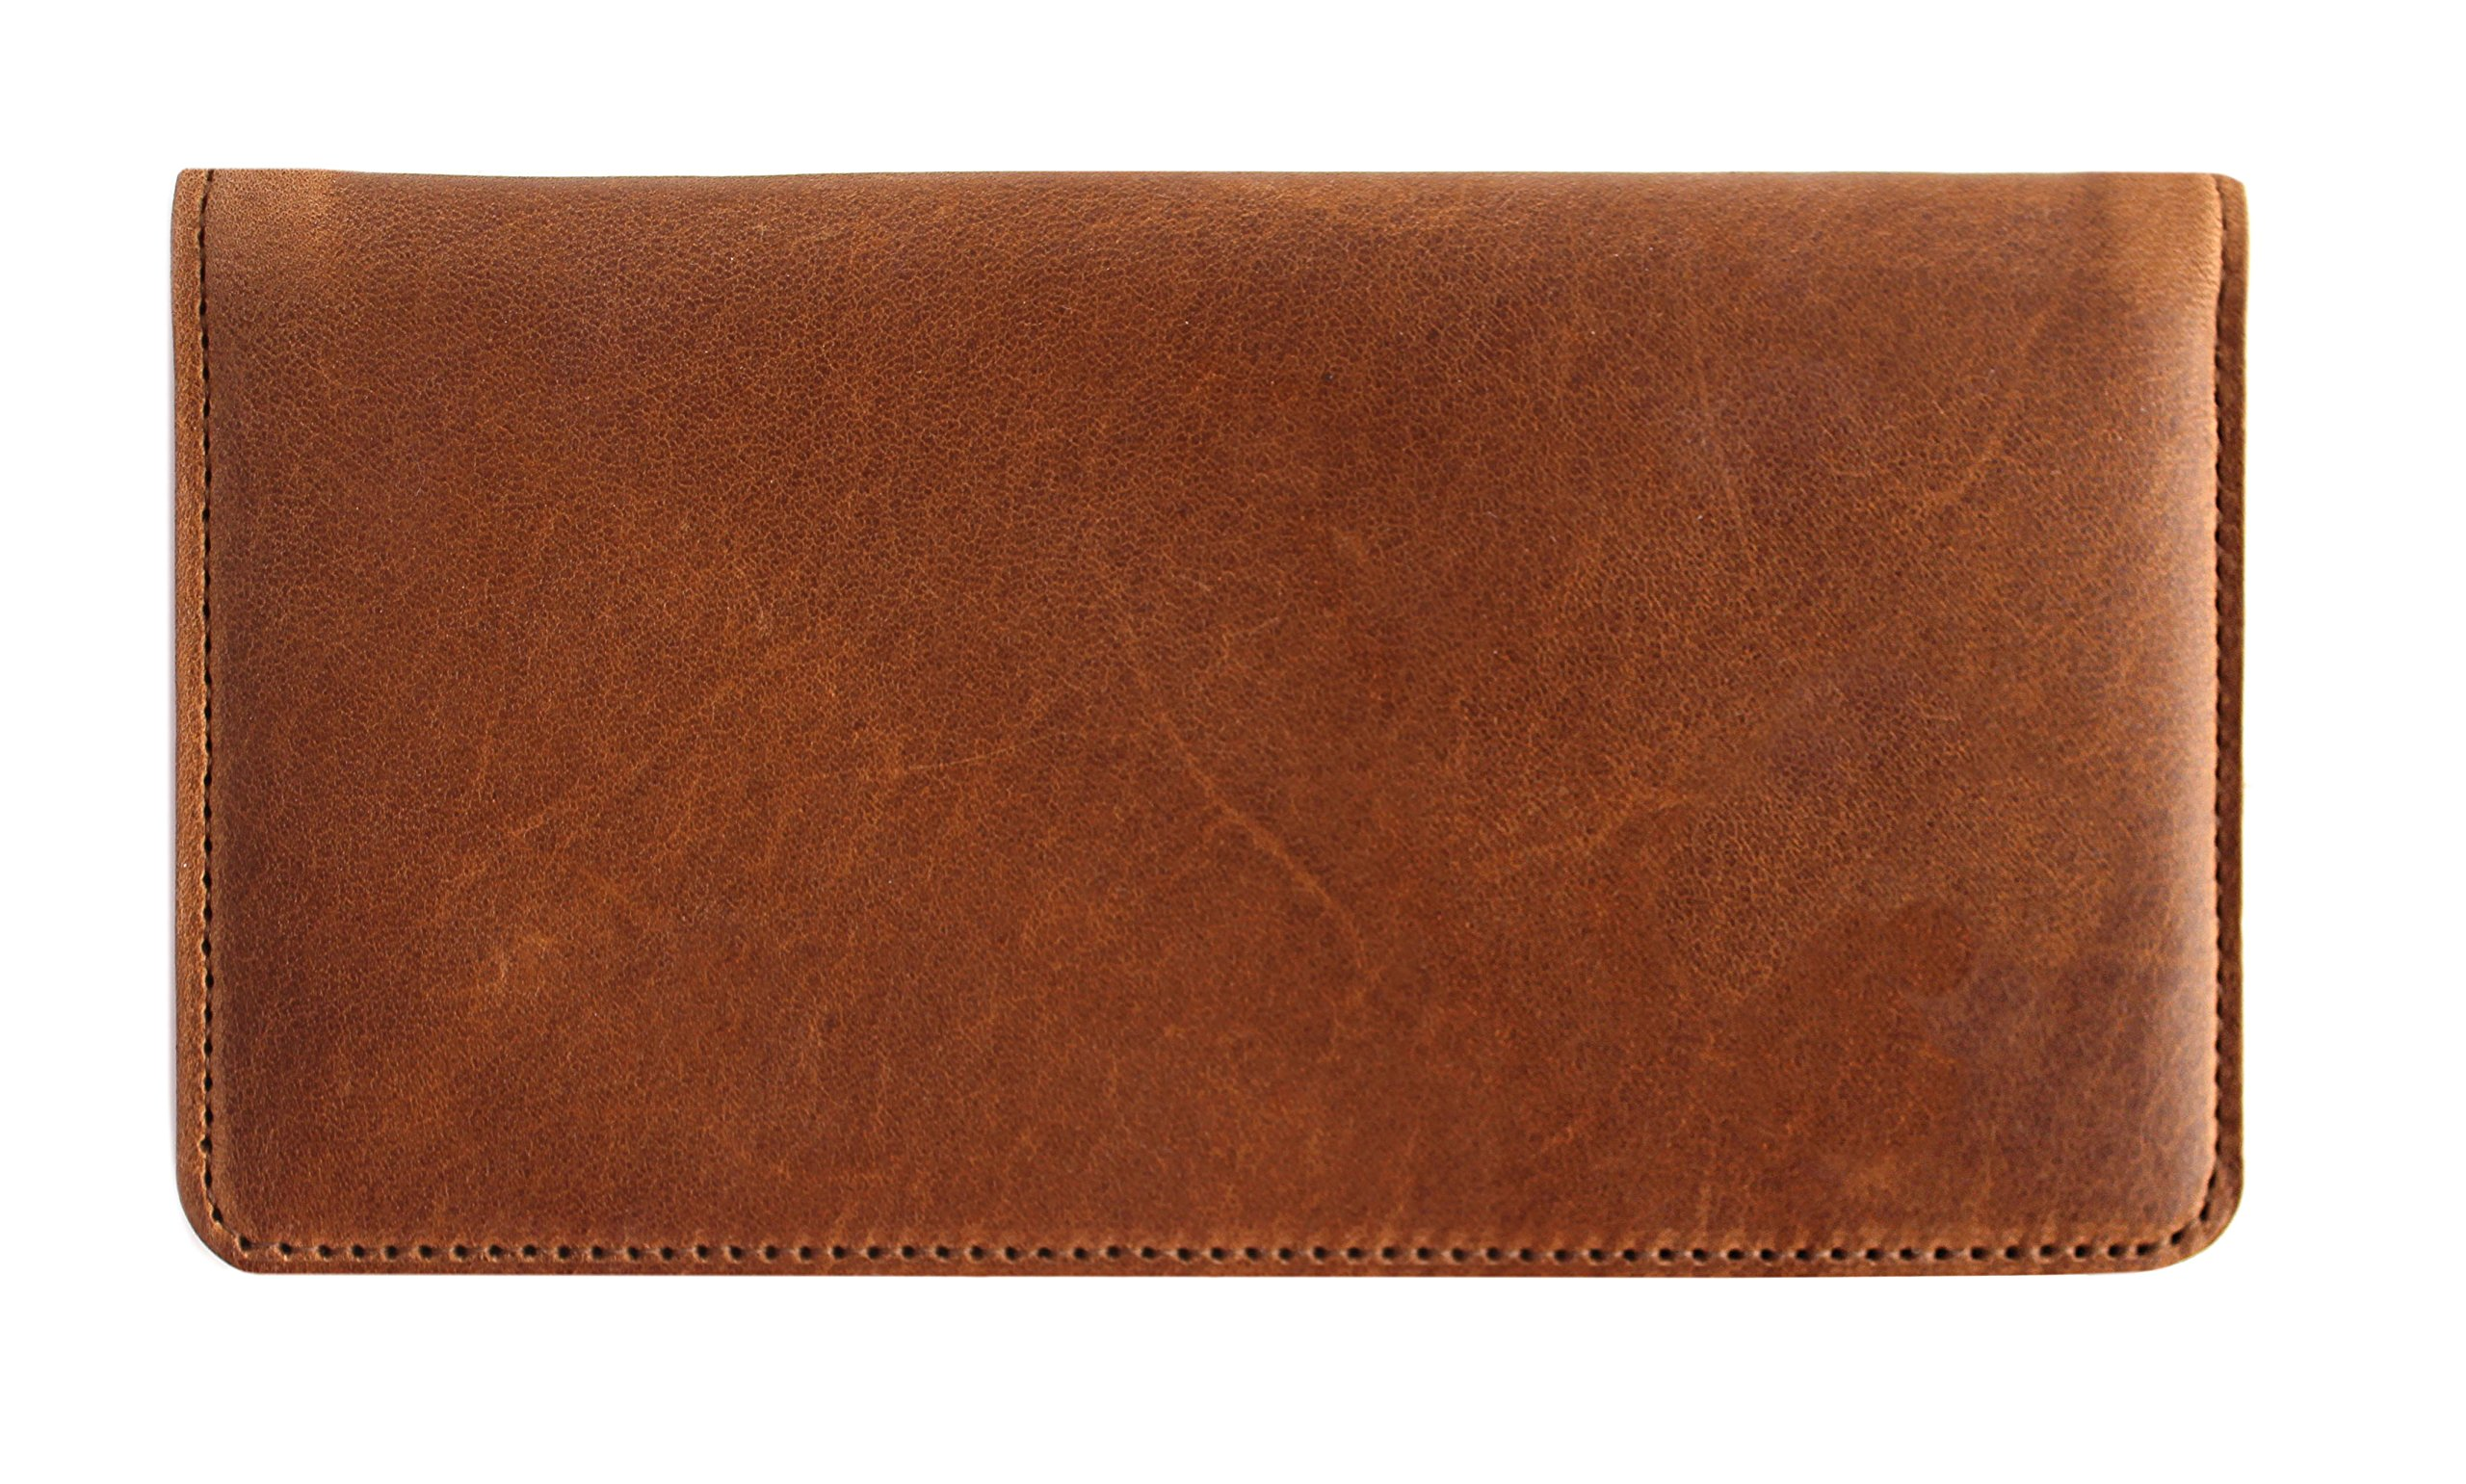 Genuine Top Grain Brown Leather Casual Checkbook Cover